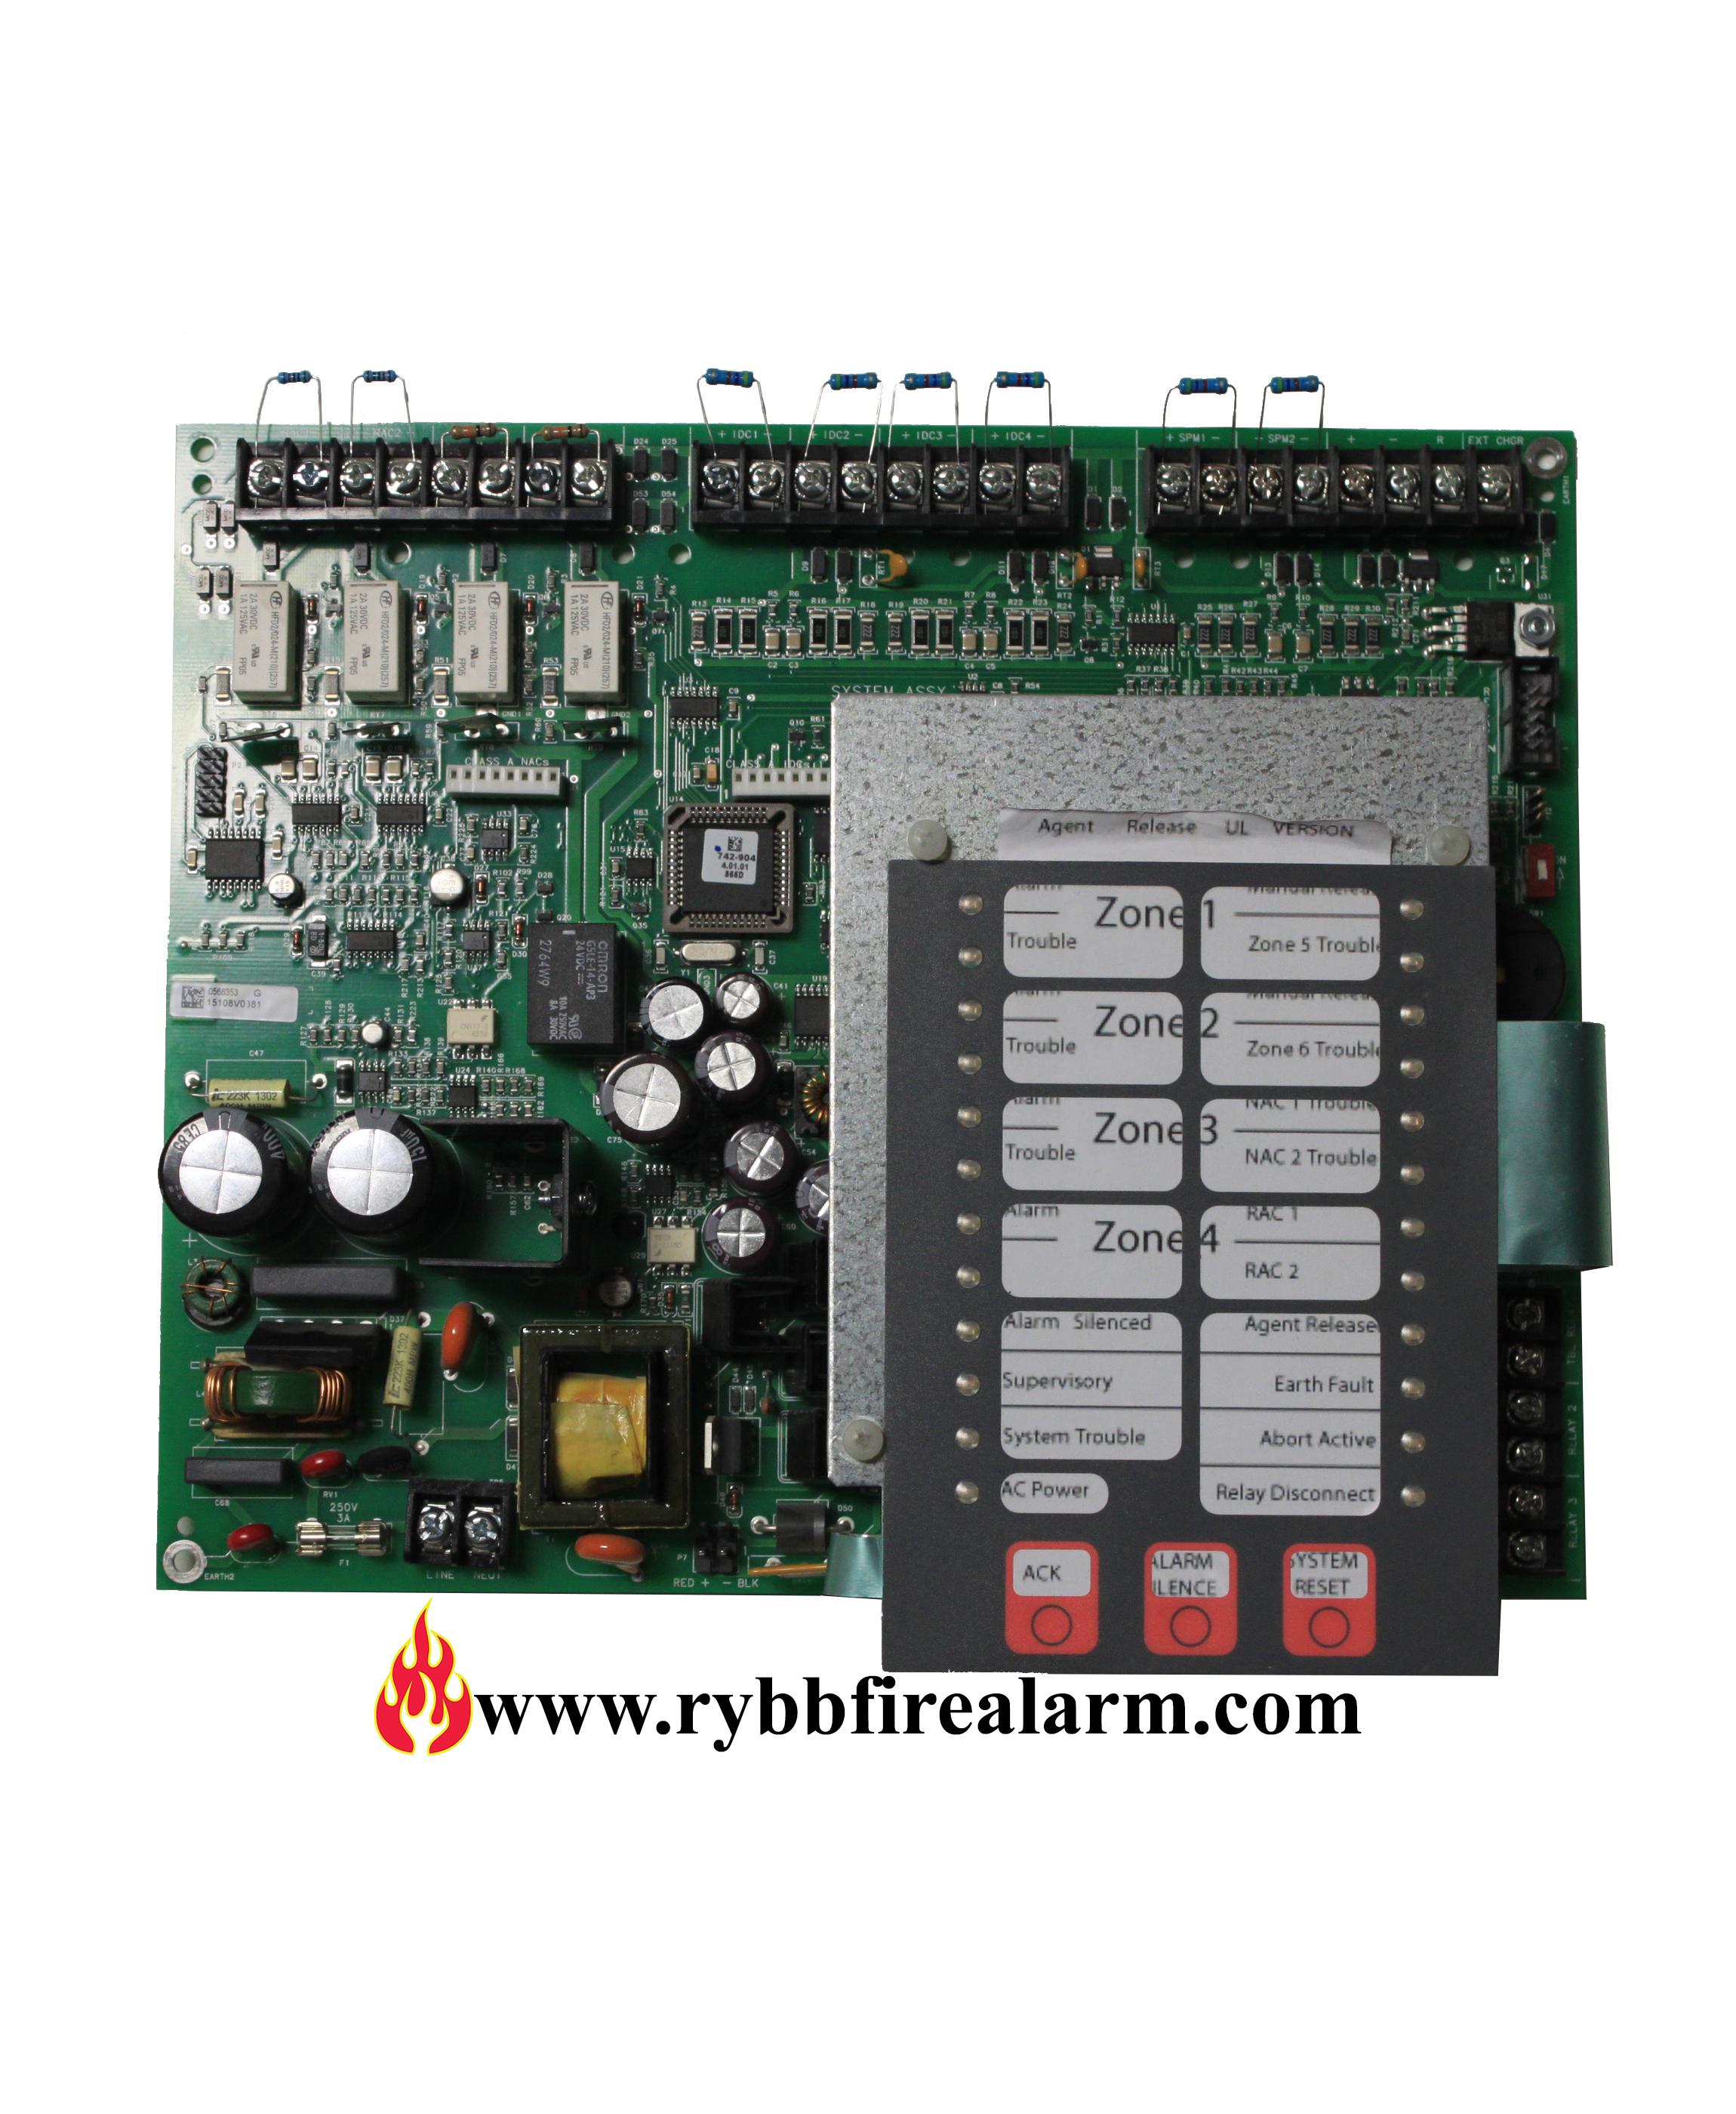 Simplex 4004 R Release Control Fire Alarm Systems Ebay